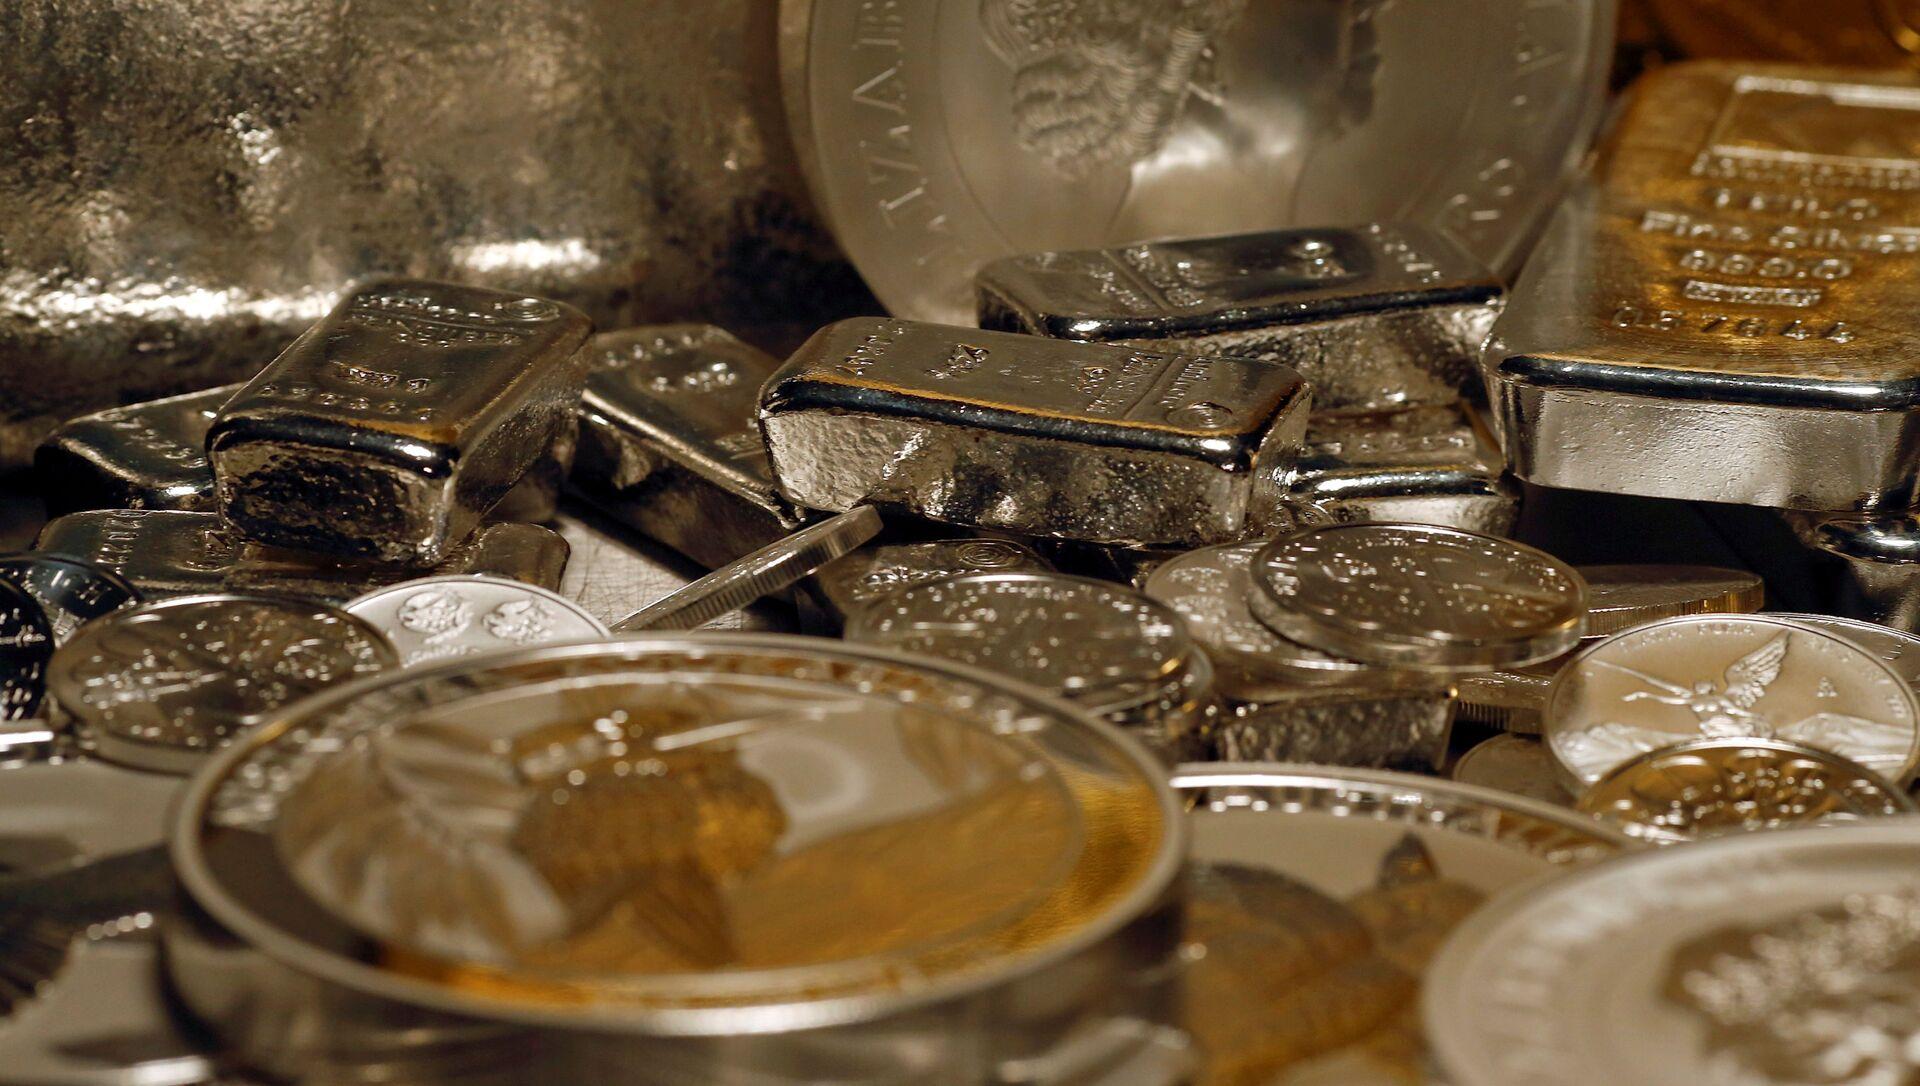 lingotti d'argento - Sputnik Italia, 1920, 01.02.2021